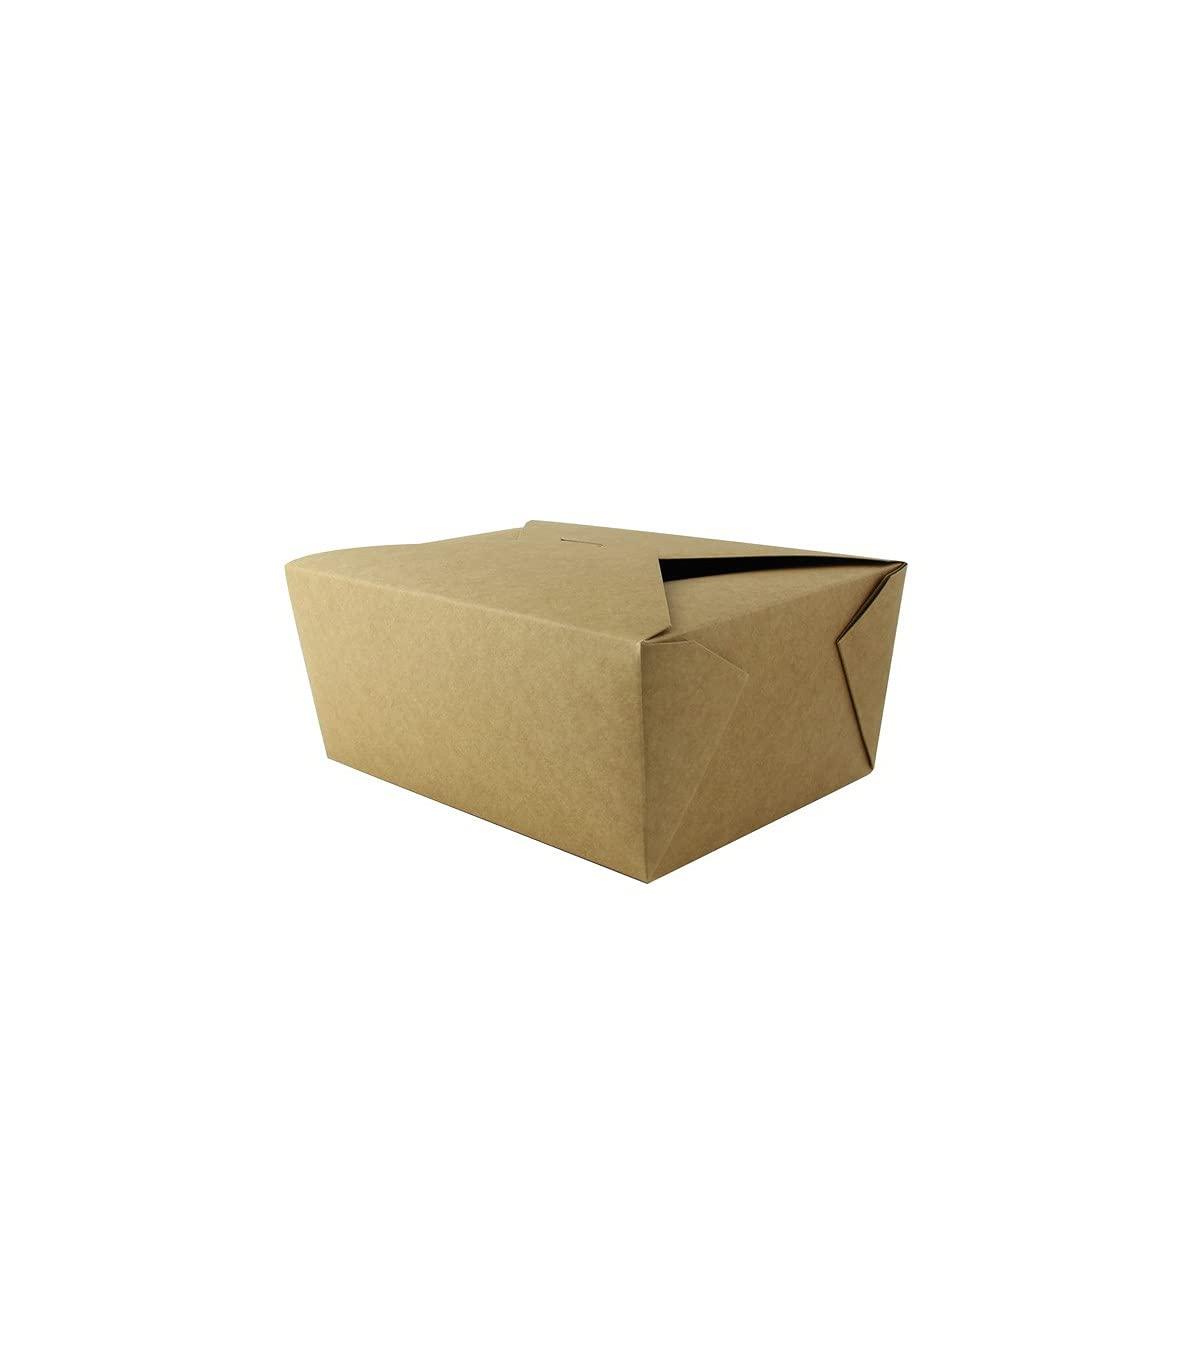 Kraft Meal Box (Case of 160), PacknWood - Biodegradable Paper Me